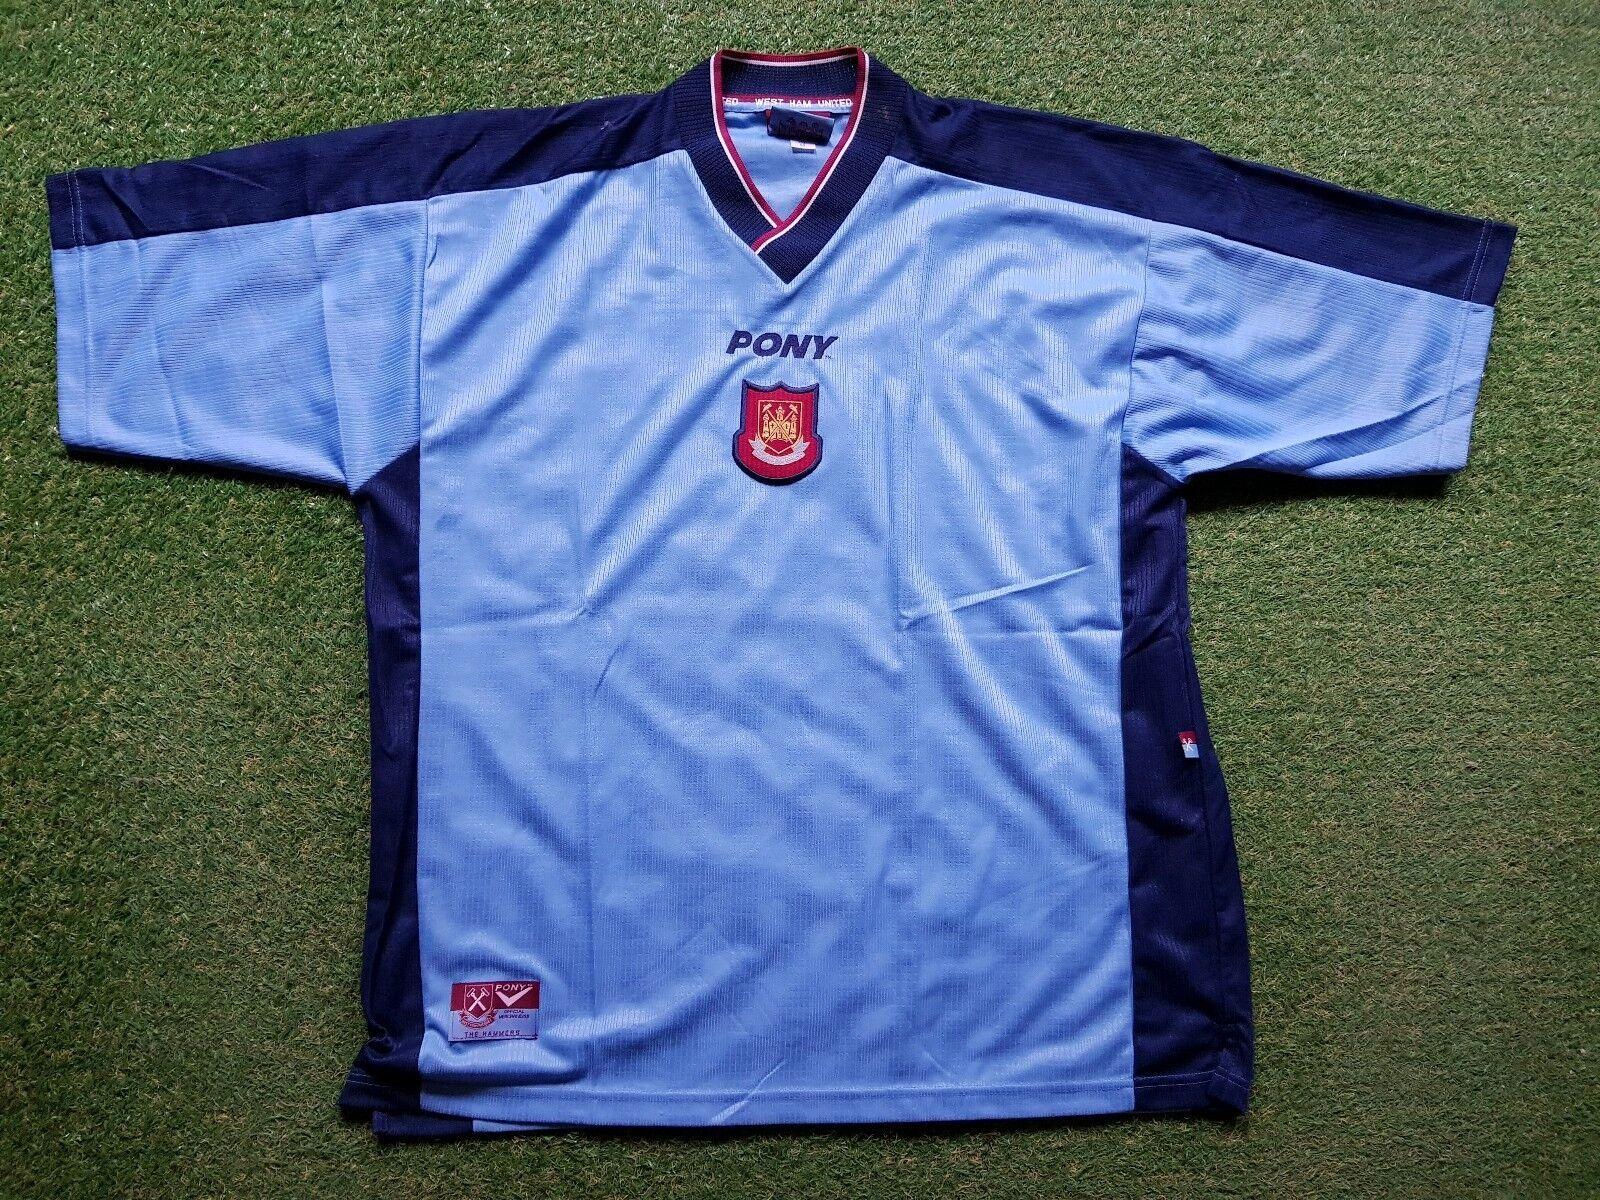 West Ham United Fútbol Camiseta XXL Pony Jersey Camiseta Maillot Camiseta 1996